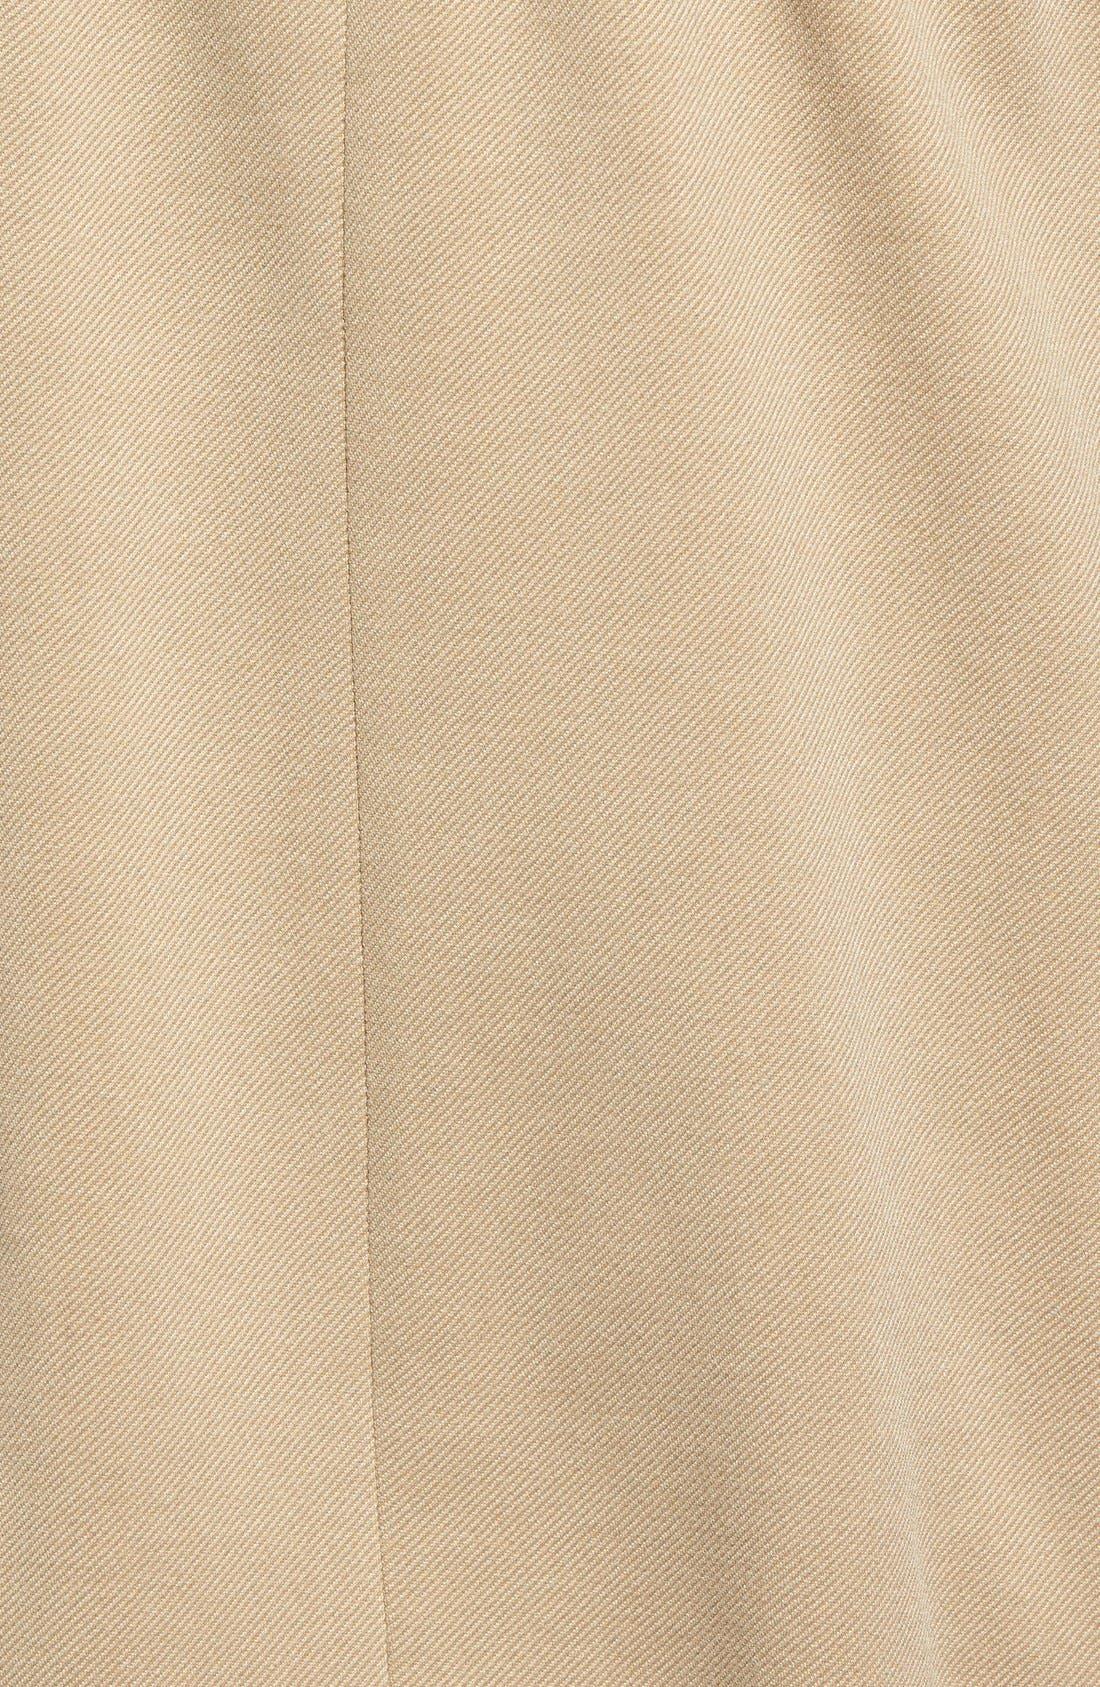 Alternate Image 5  - Vince CamutoFauxLeather Sleeve Asymmetrical Anorak